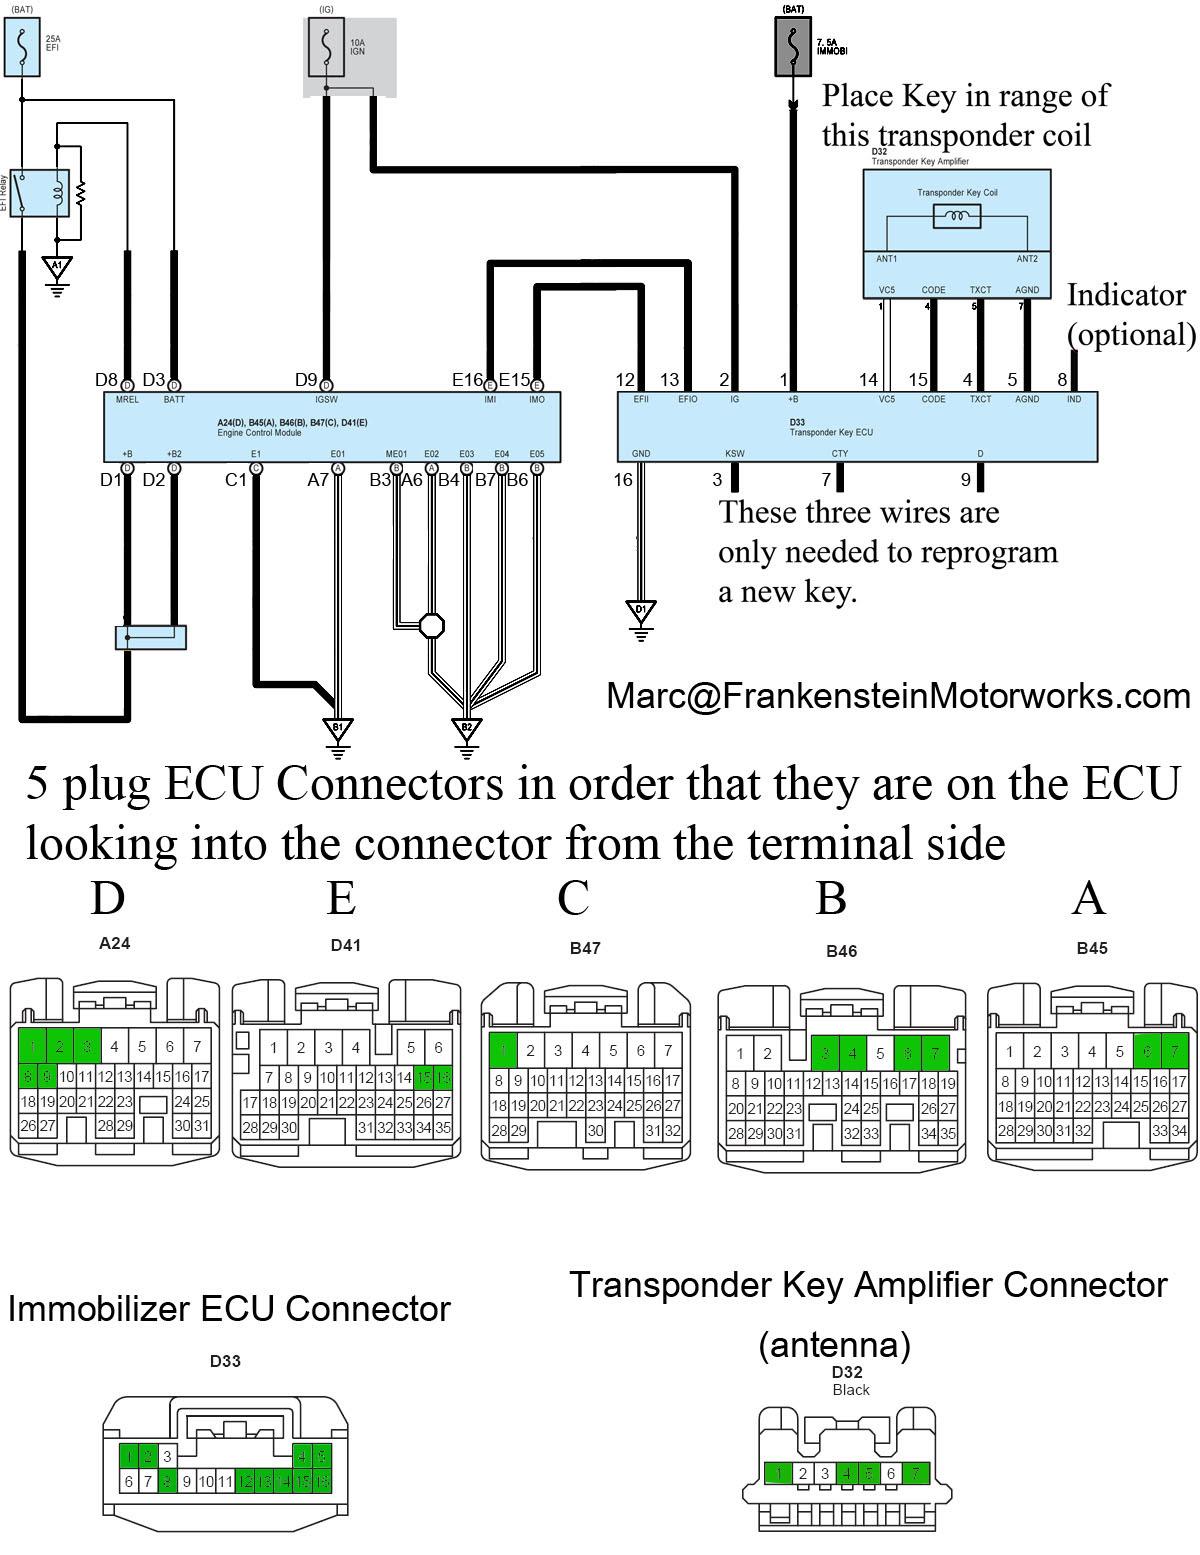 Diagram 2nz Fe Ecu Wiring Diagram Full Version Hd Quality Wiring Diagram Supportarrowstructure Medicinadellasaluteebellezza It